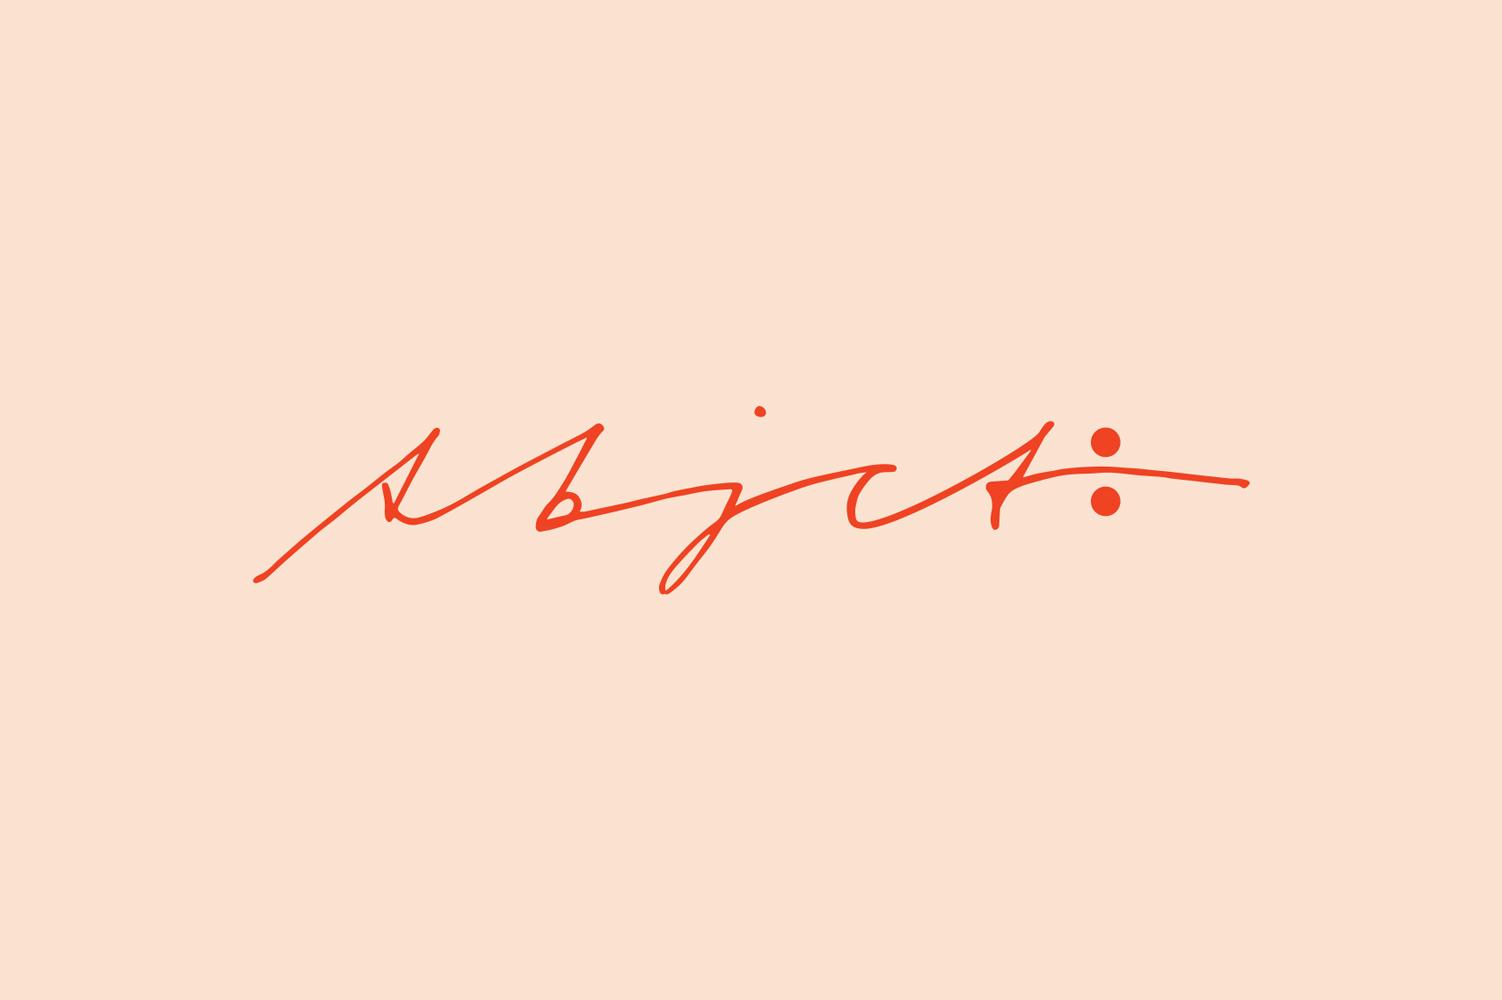 Sbjct Journal - Identity and Website Design